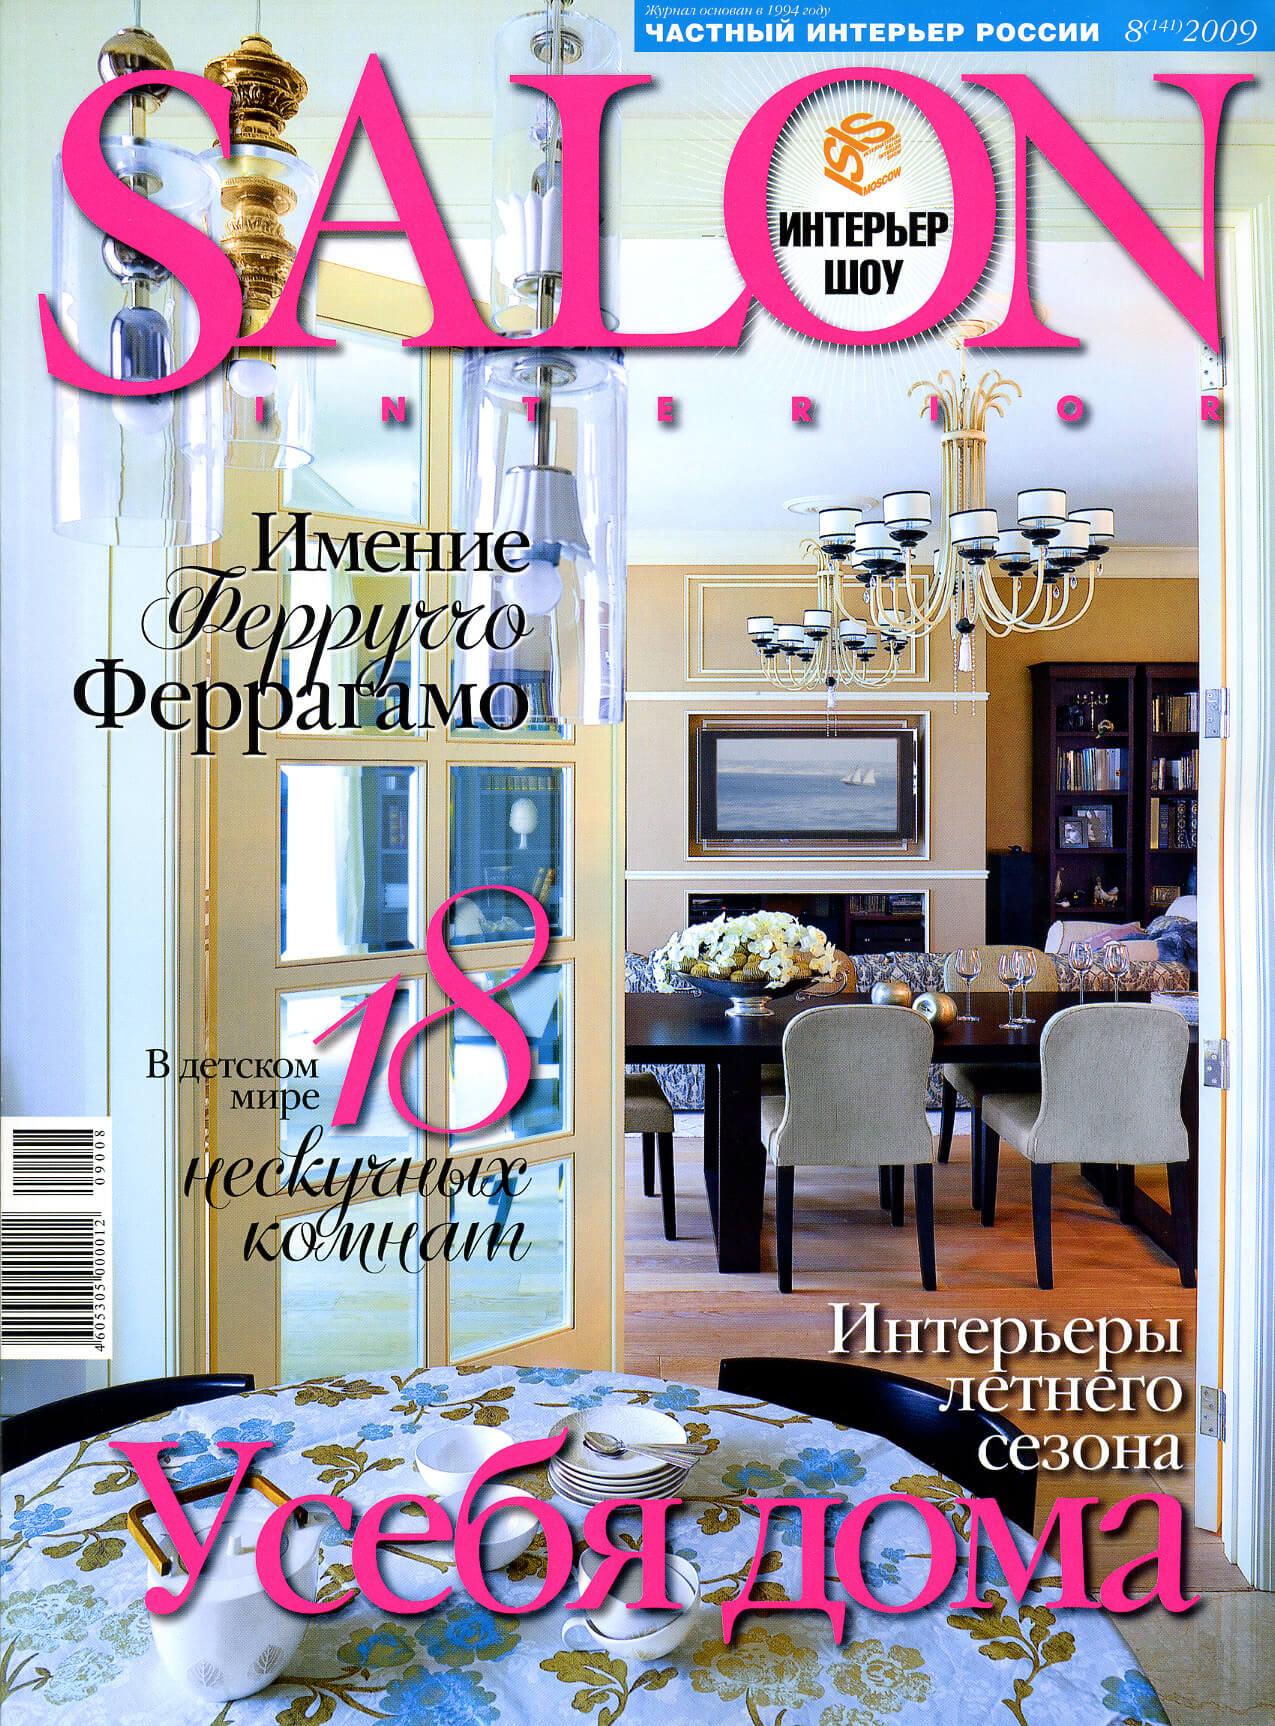 Salon 8 (141) 2009